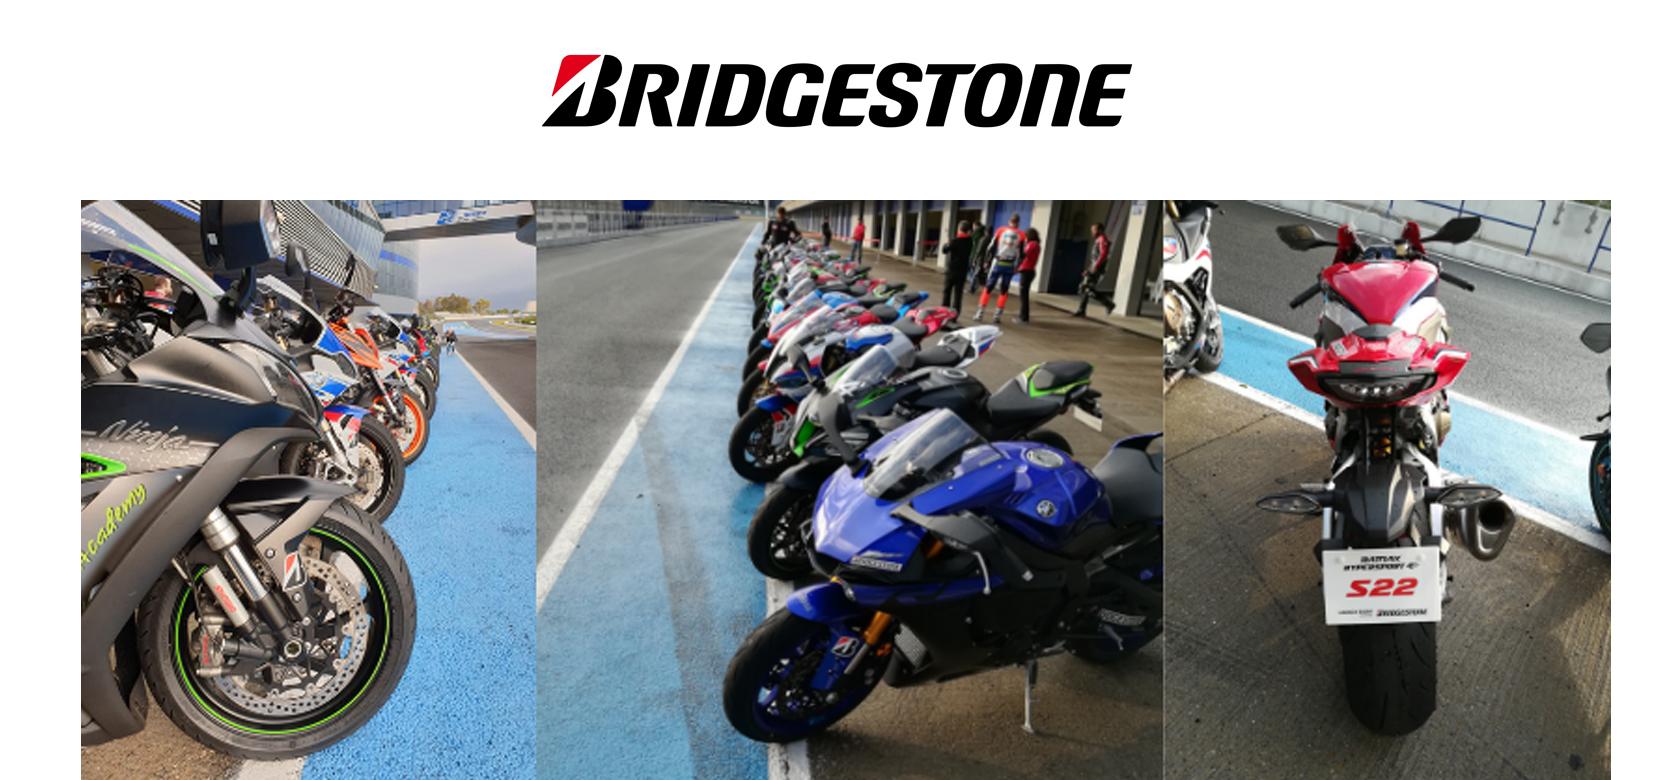 BRIDGESTONE | BATTLAX HYPERSPORT S22 – Apresentação em Jerez 2